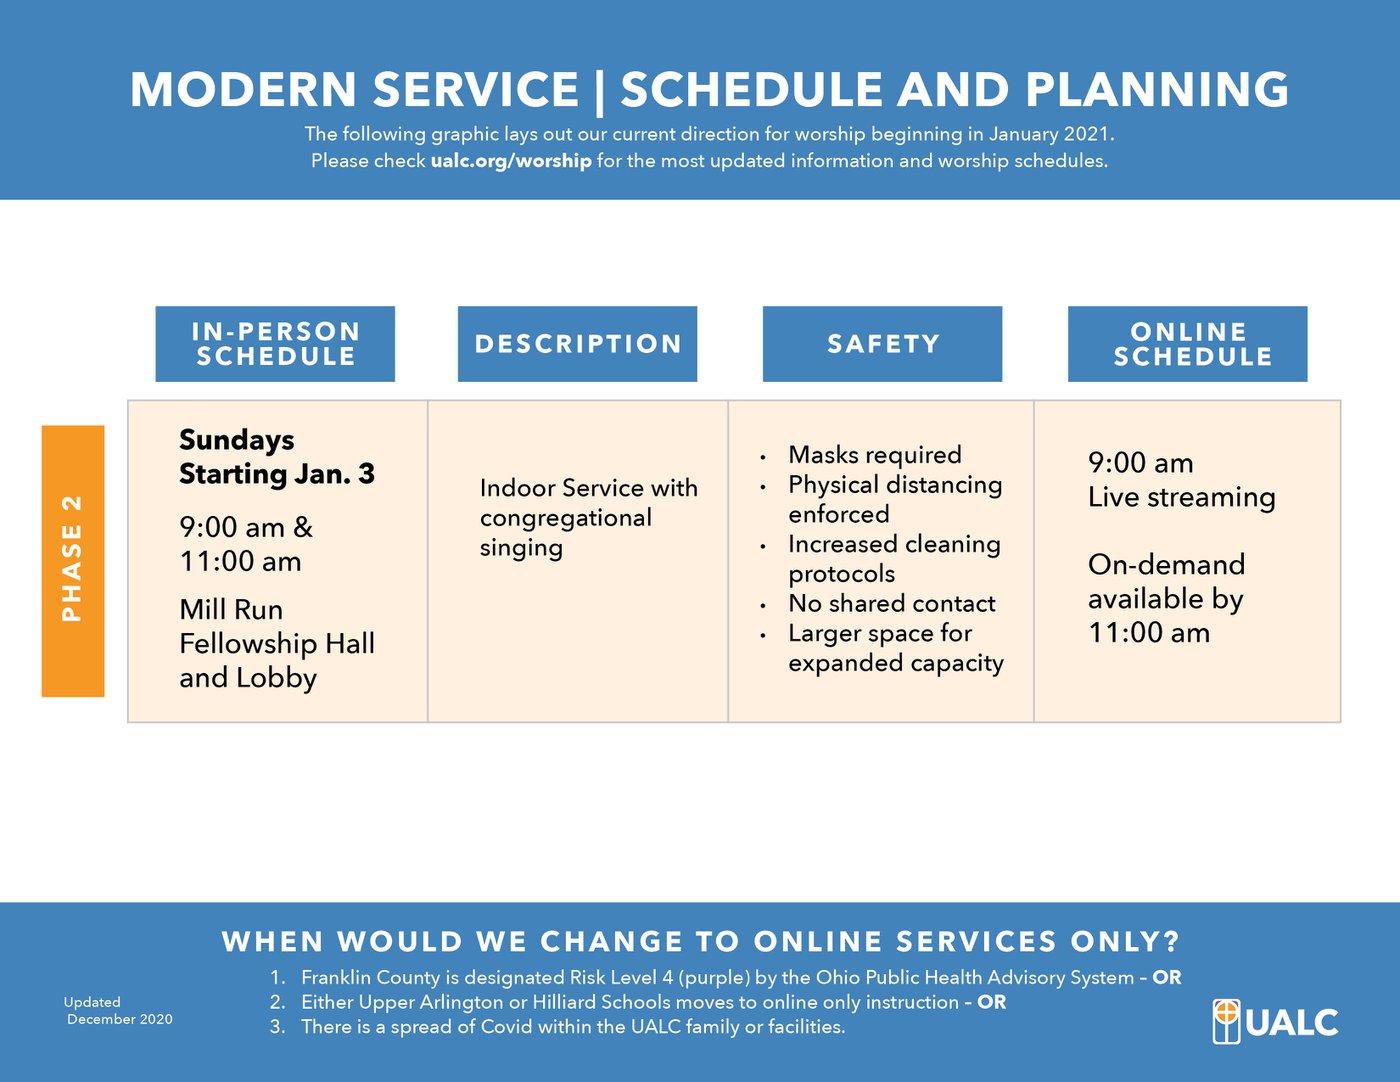 UALC 2021- Modern Service - Phase 2 Worship Schedule